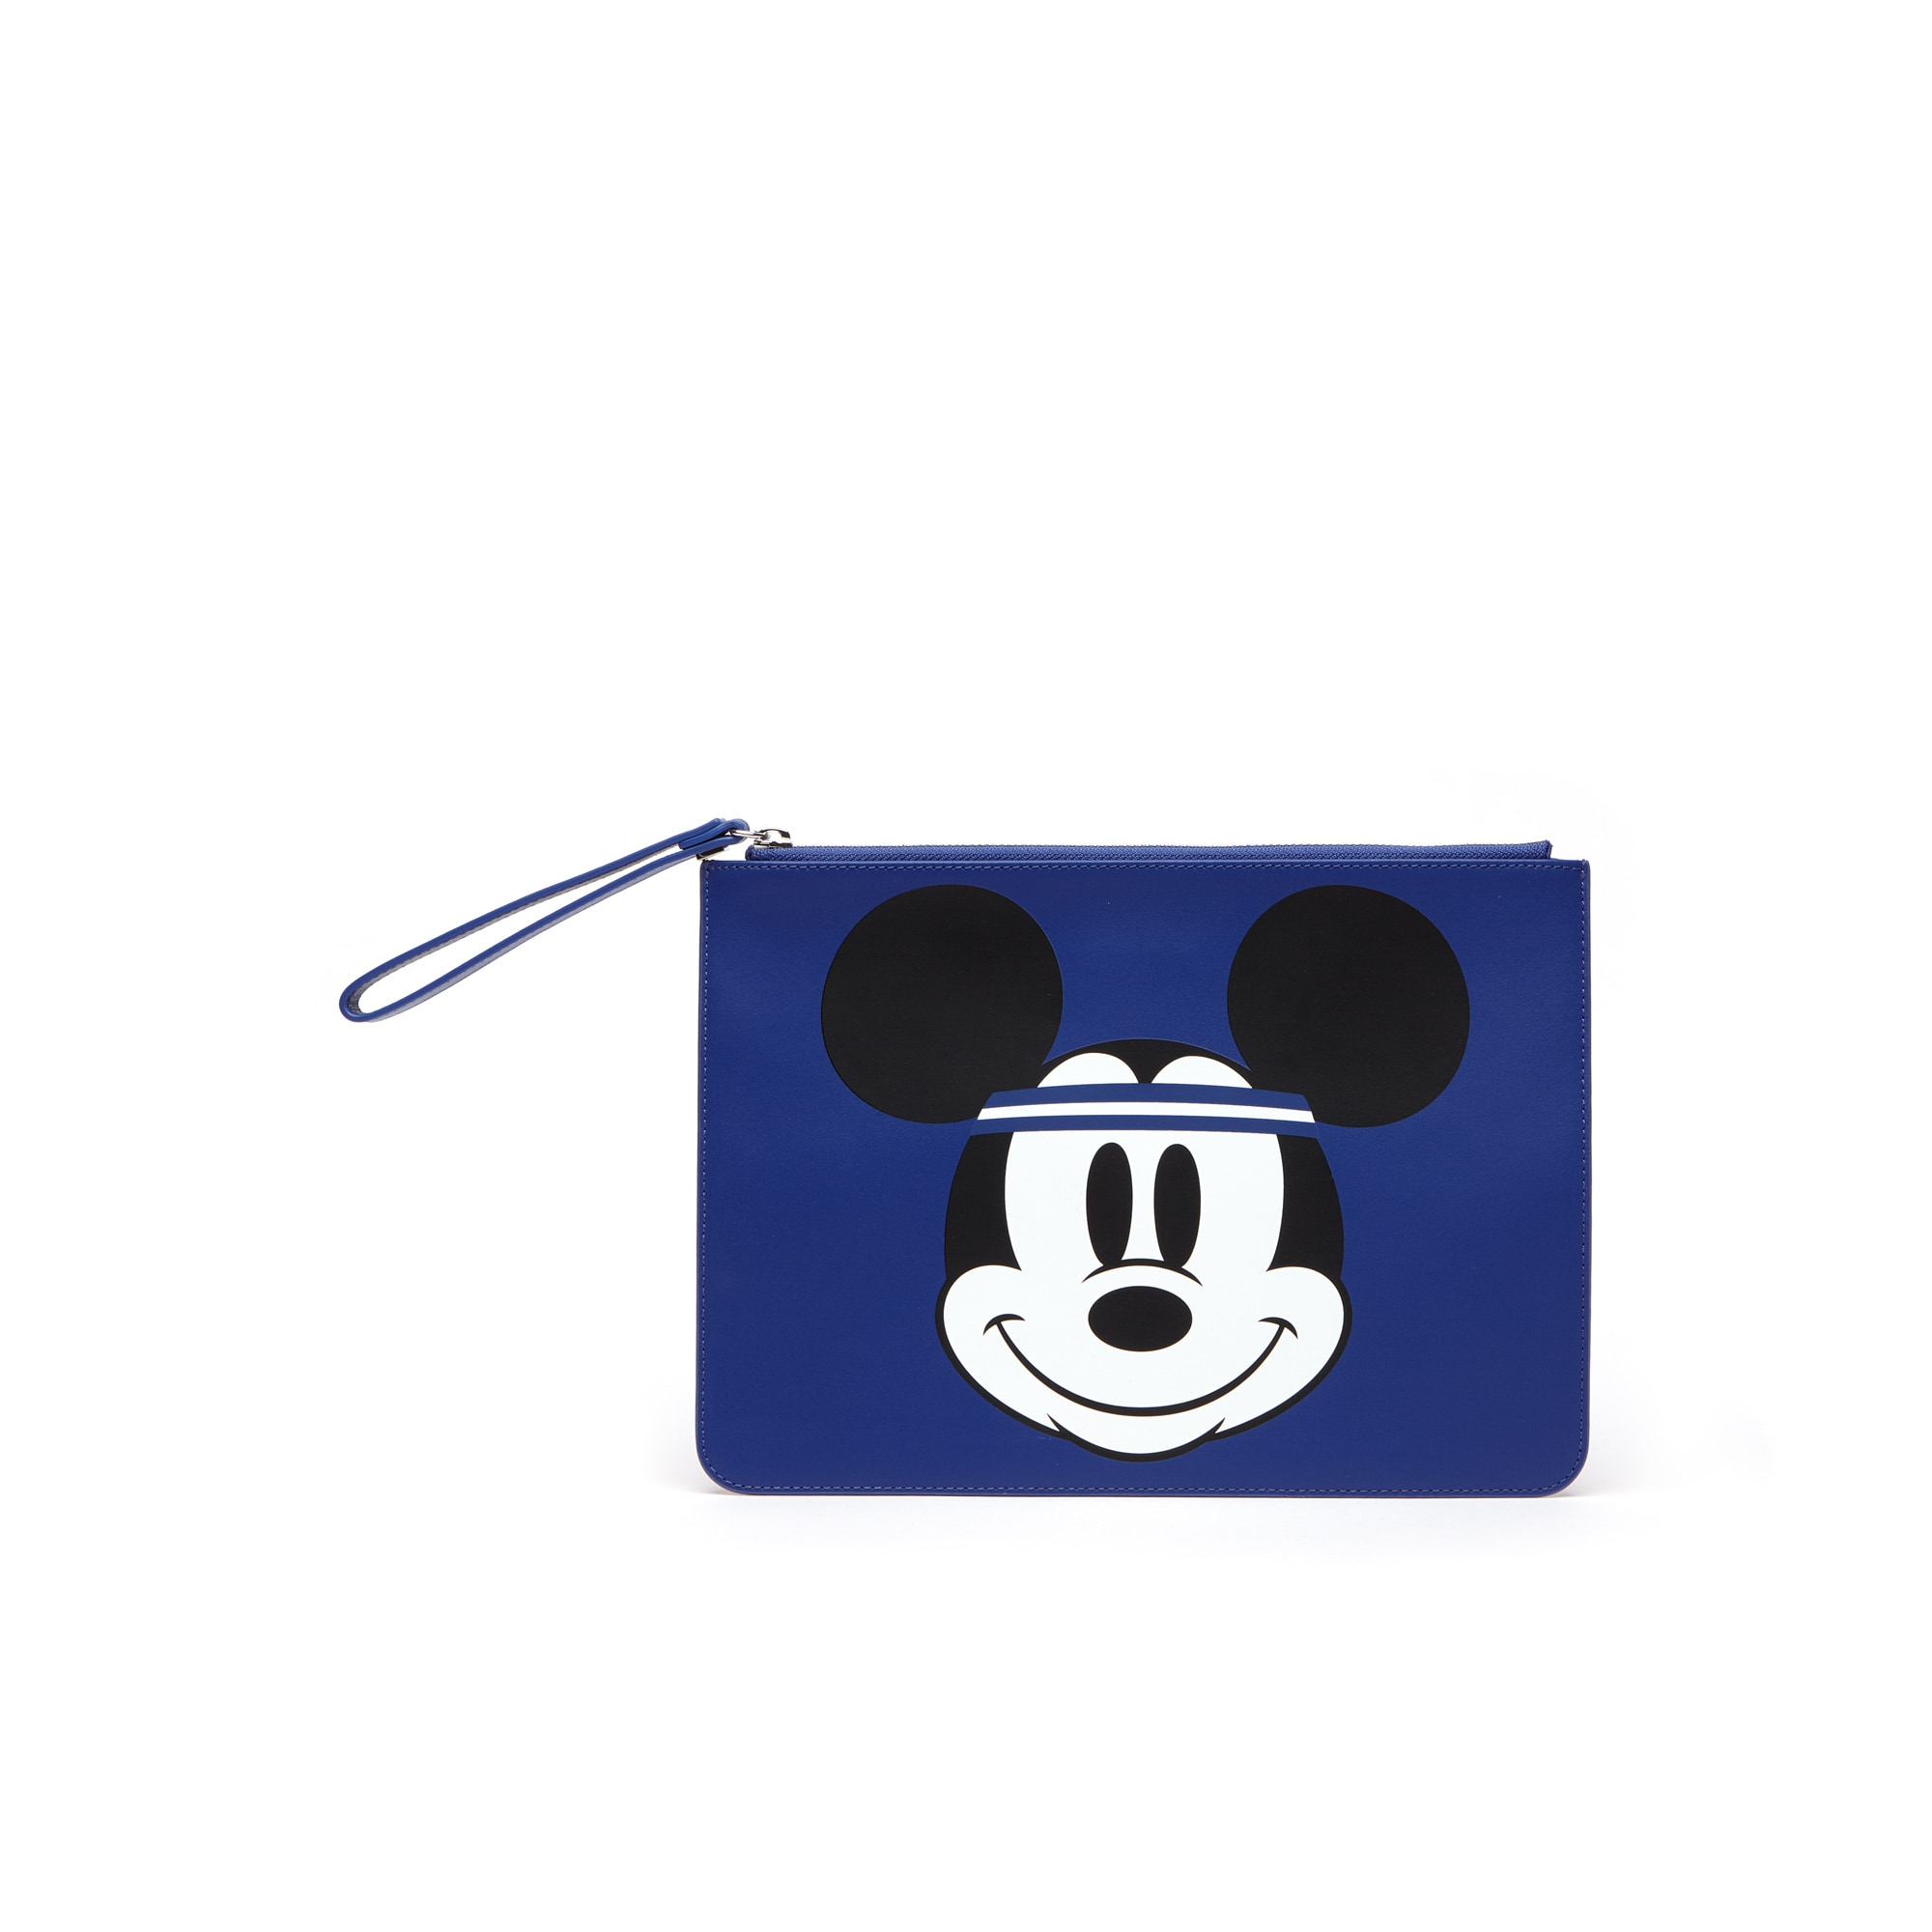 Pochette zippée Holiday Collector en cuir imprimé Mickey Collab Disney